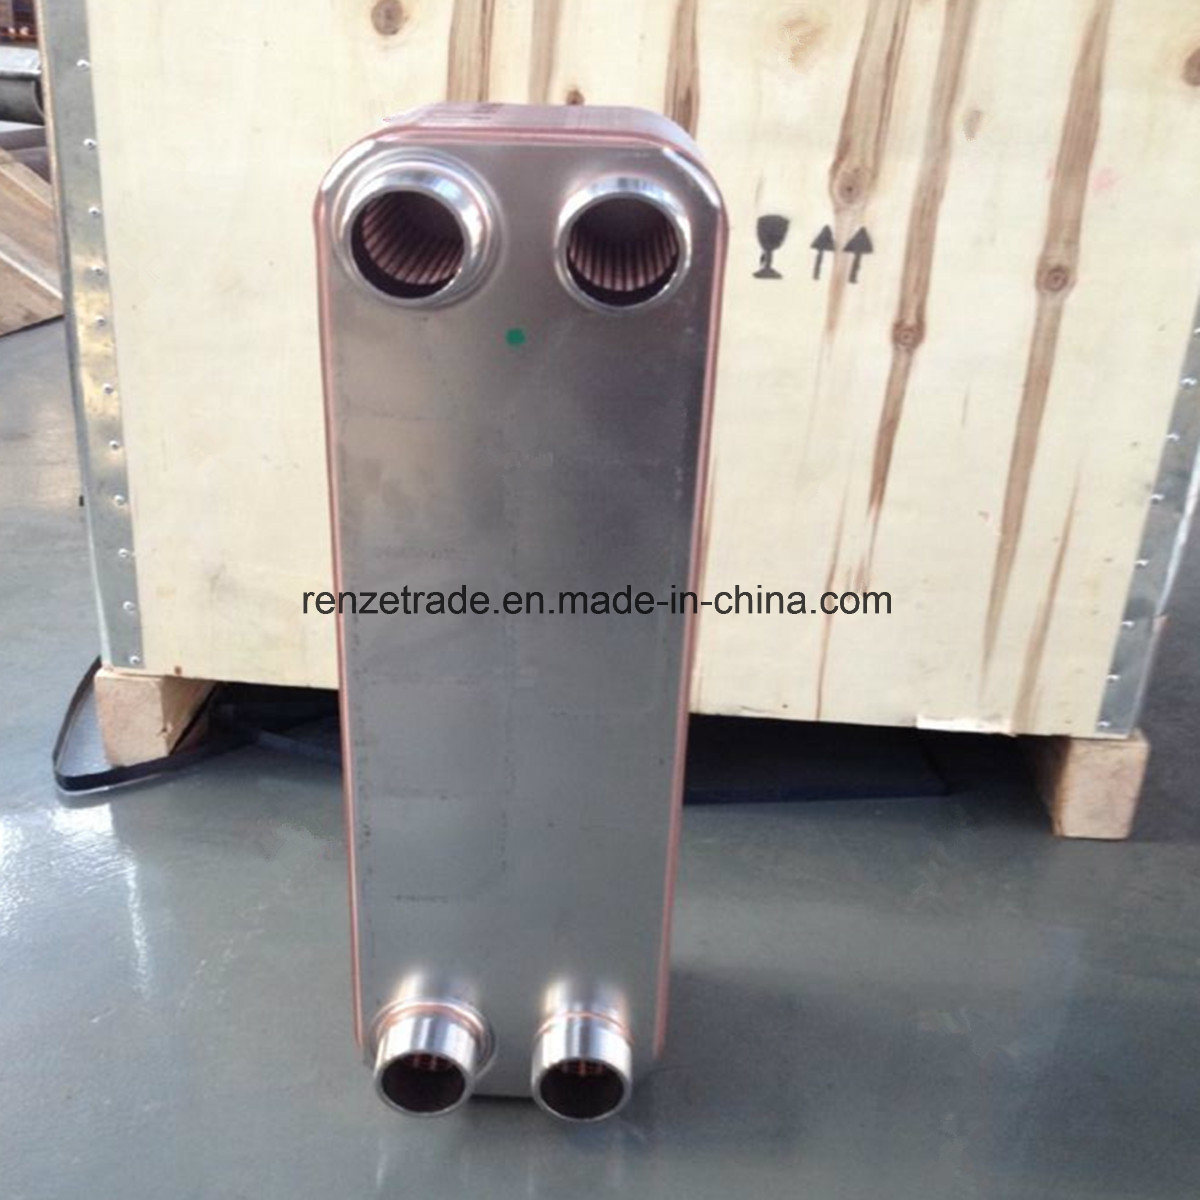 Refrigerant R22, R404A, R410A Condenser Central Heating Copper Brazed Plate Heat Exchanger